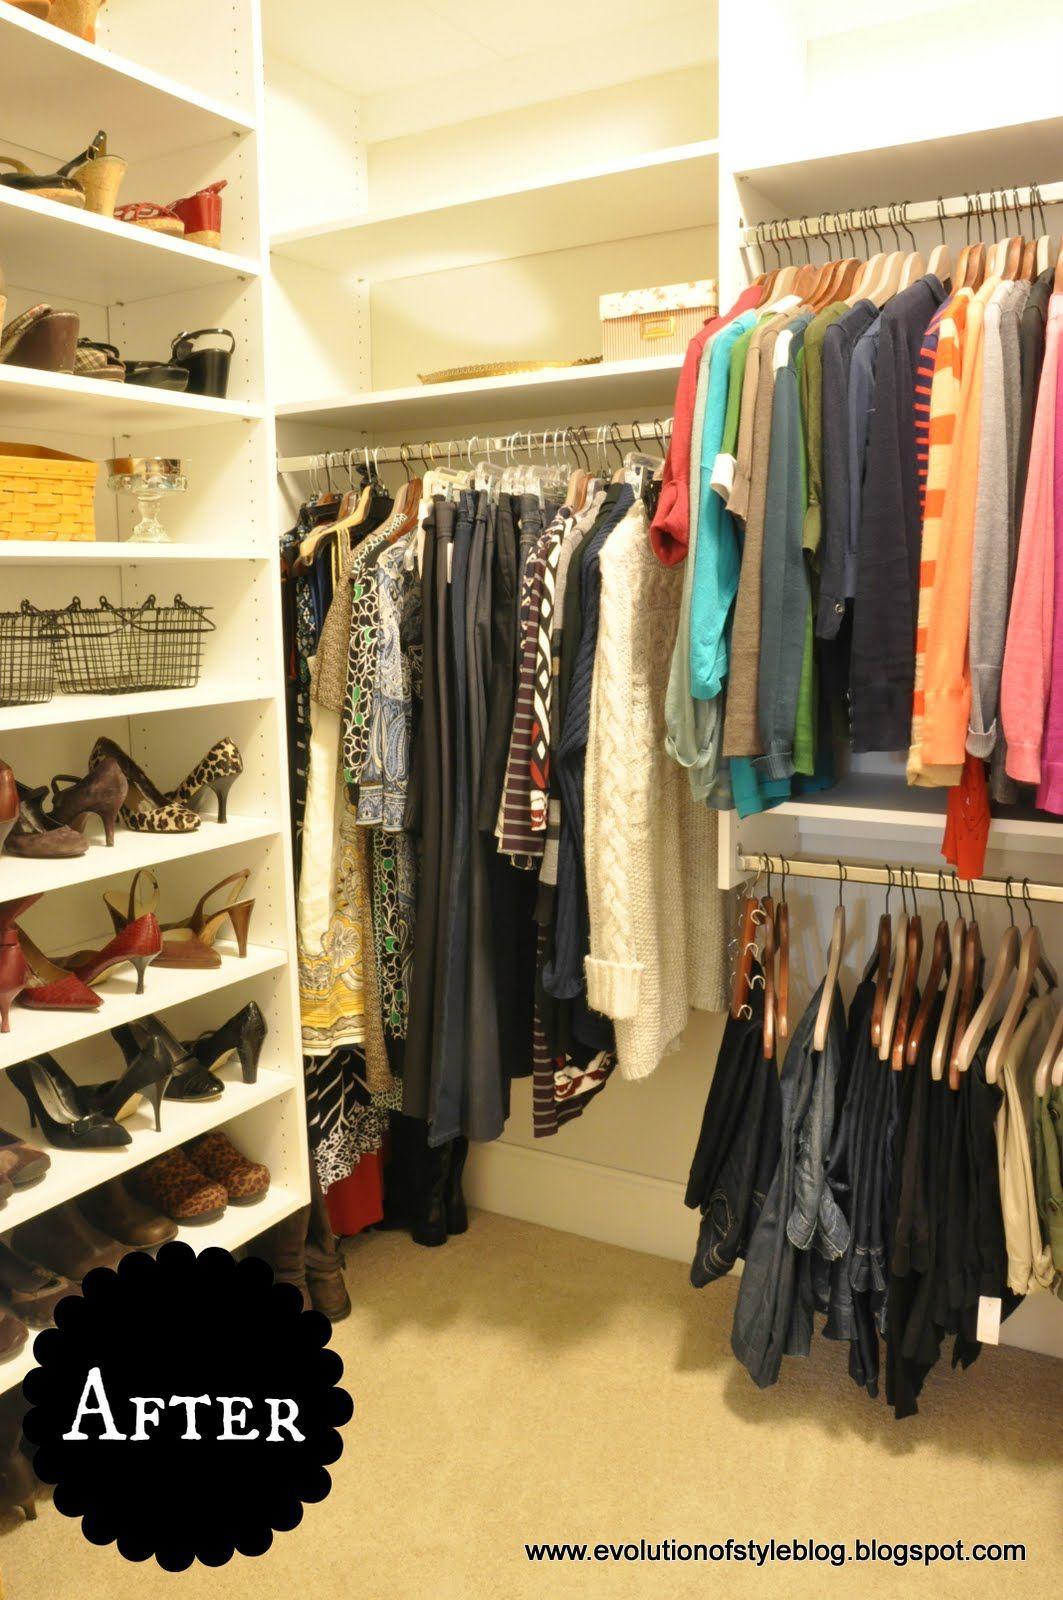 Evolution of Style: Master Closet Progress and Plans